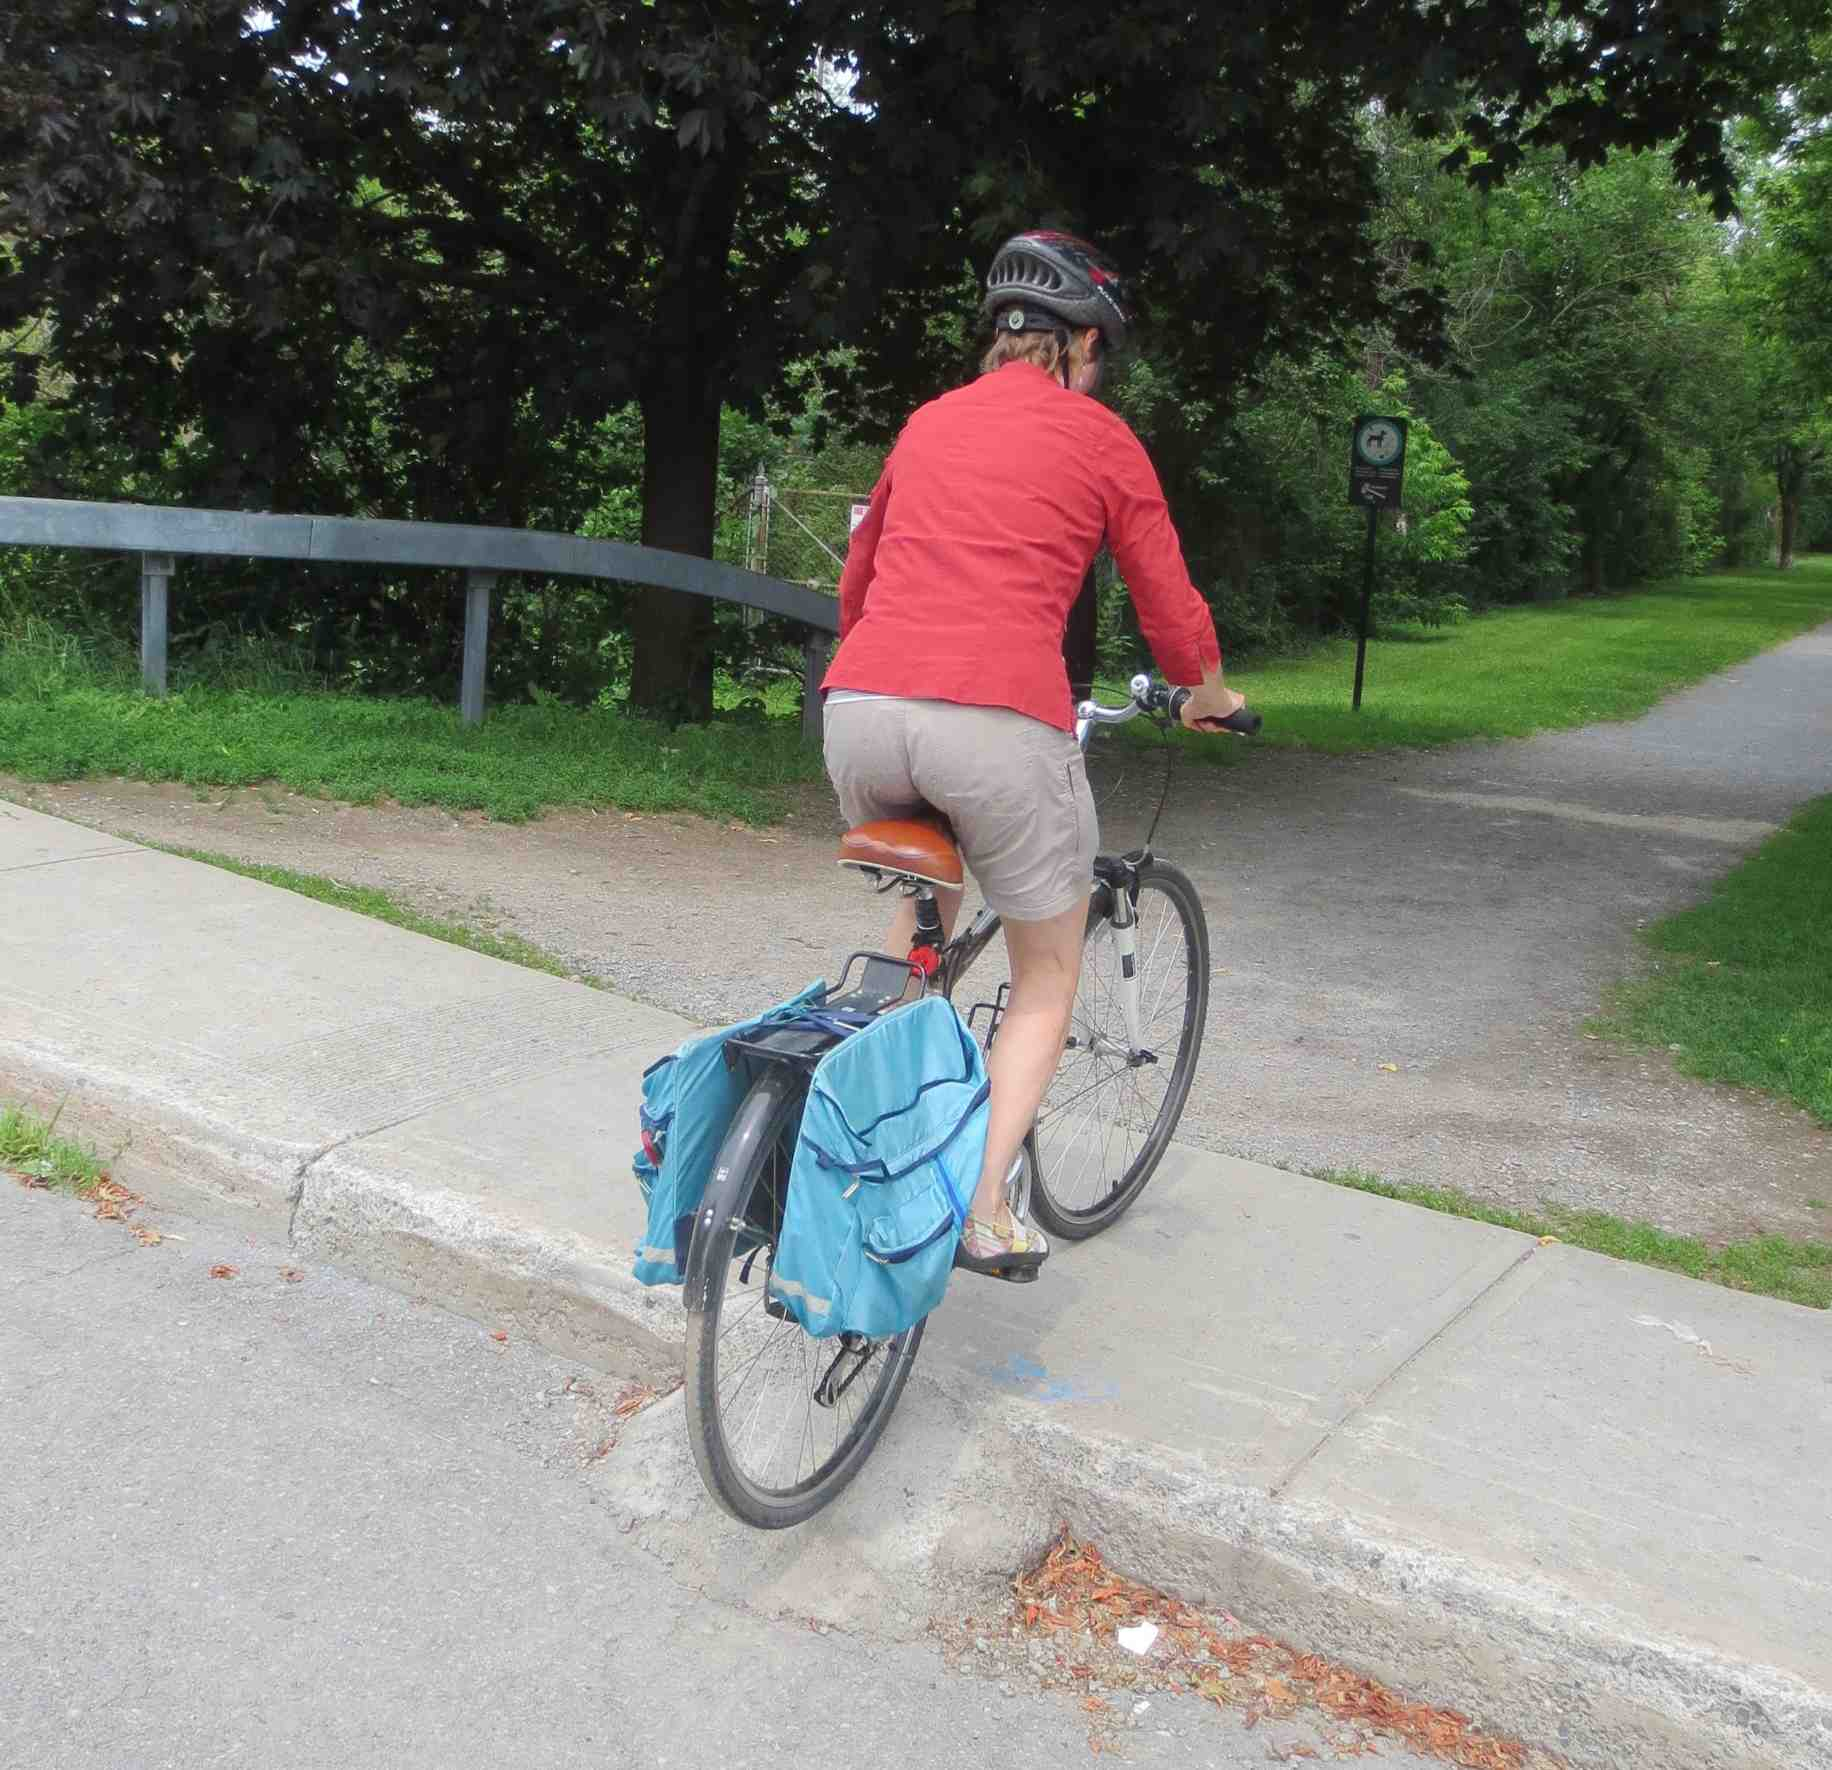 2013 07 01 Bike Ottawa Canada Day 03